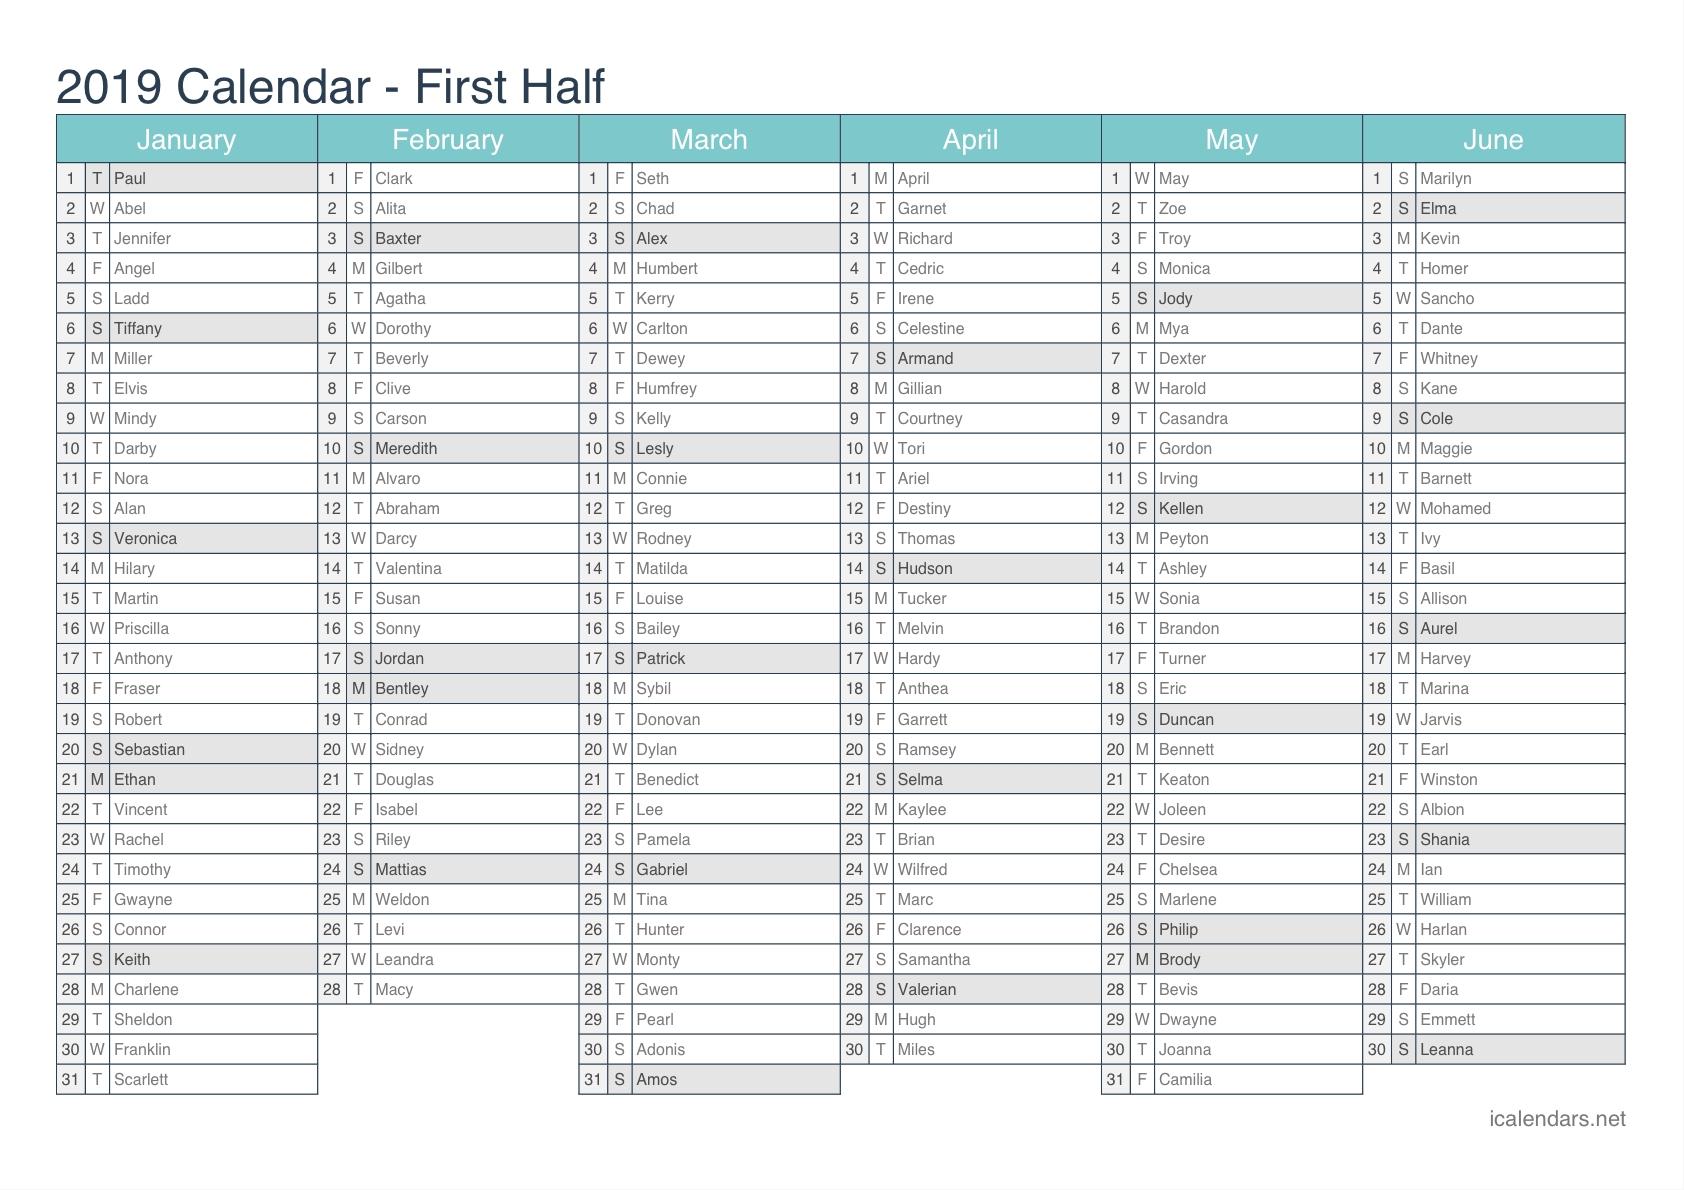 2019 Printable Calendar - Pdf Or Excel - Icalendars Calendar 2019 Excel Spreadsheet